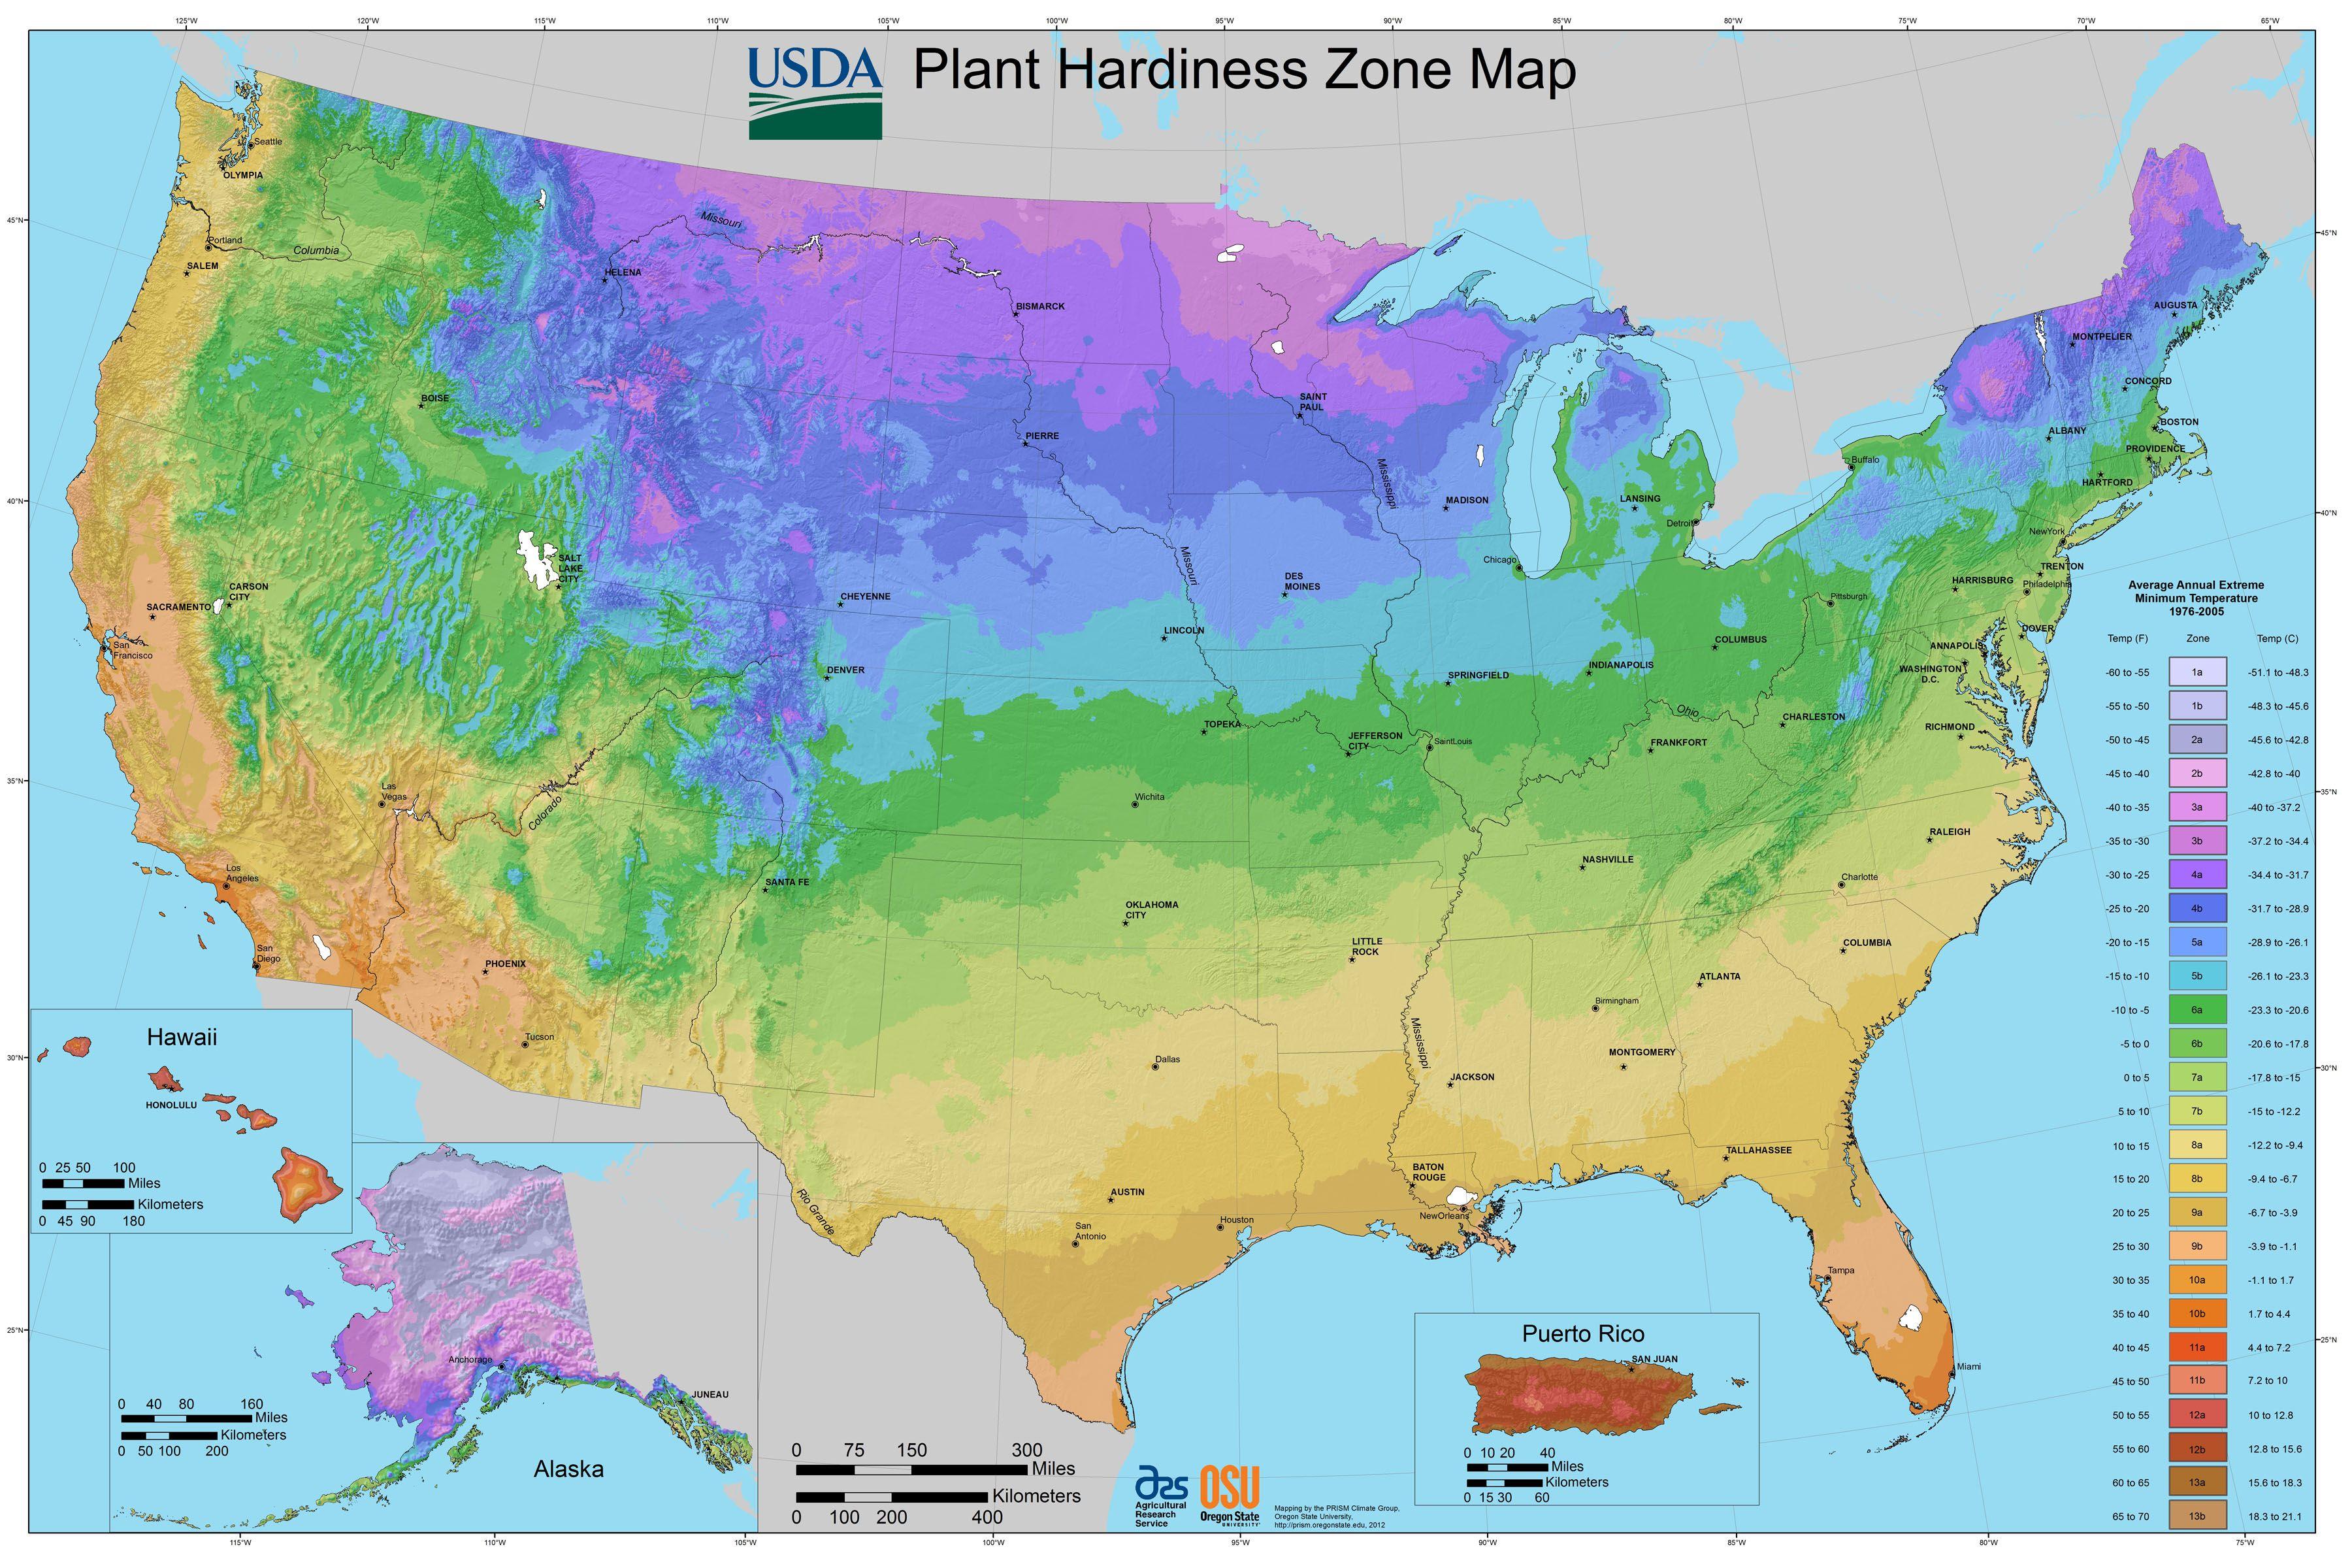 093958066bb817bbce5987b658631b78 - What Gardening Zone Is Minnesota In